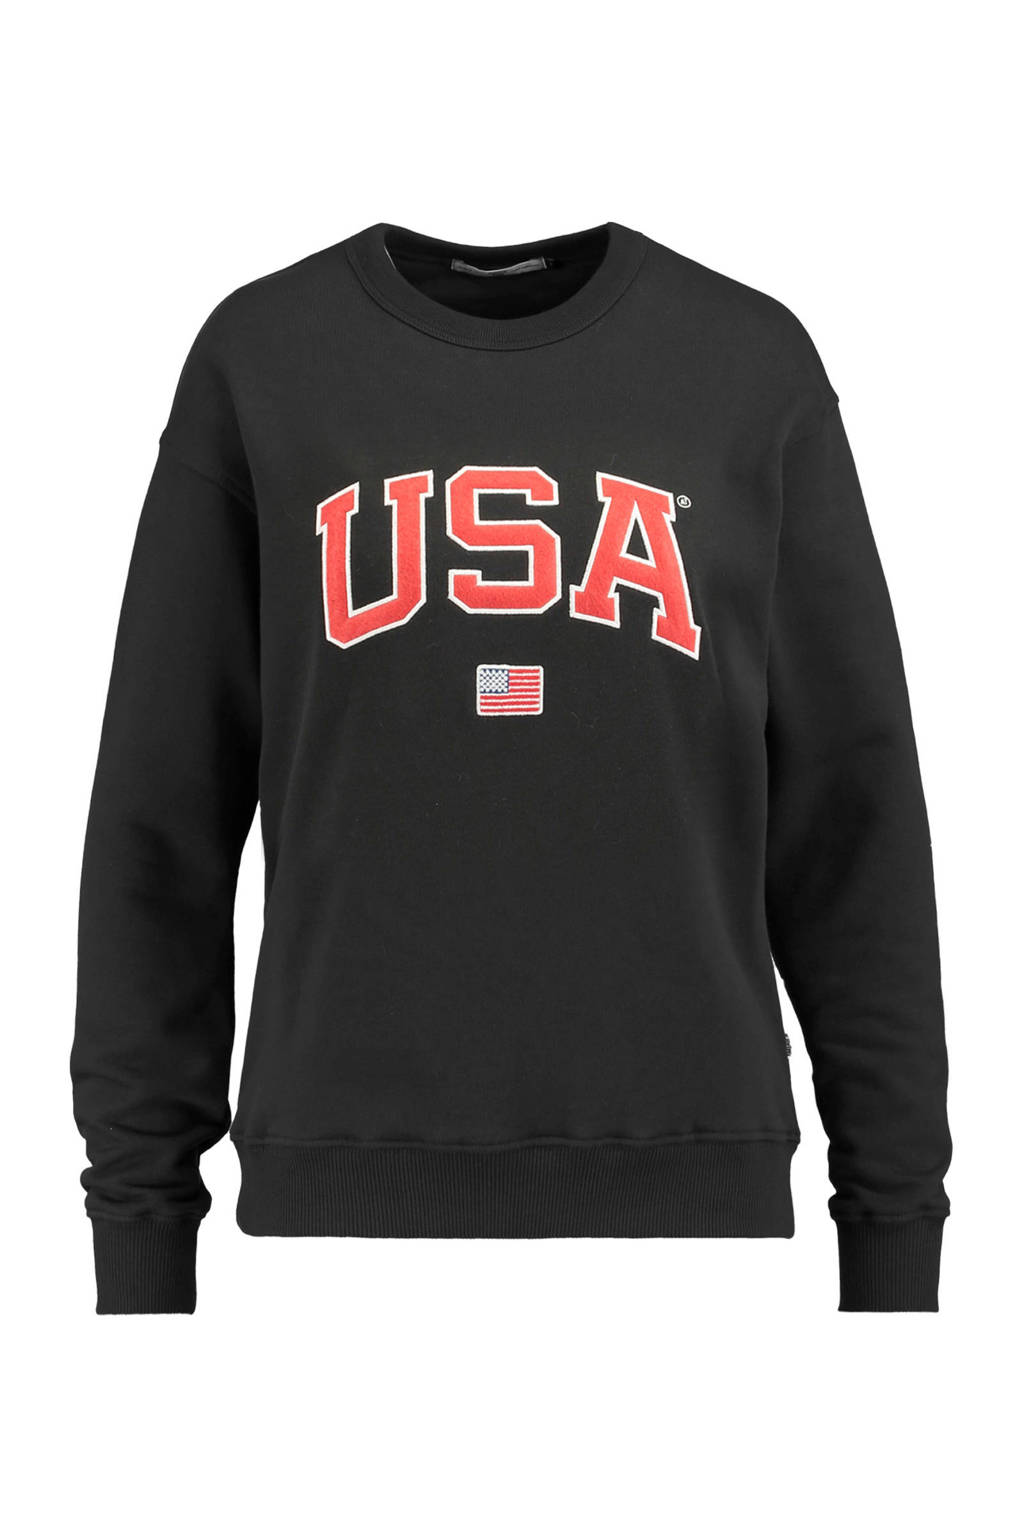 Soel Zwart Todaysweater Soel Todaysweater Zwart Soel America Zwart America Todaysweater America Todaysweater America qREf5dnxqw